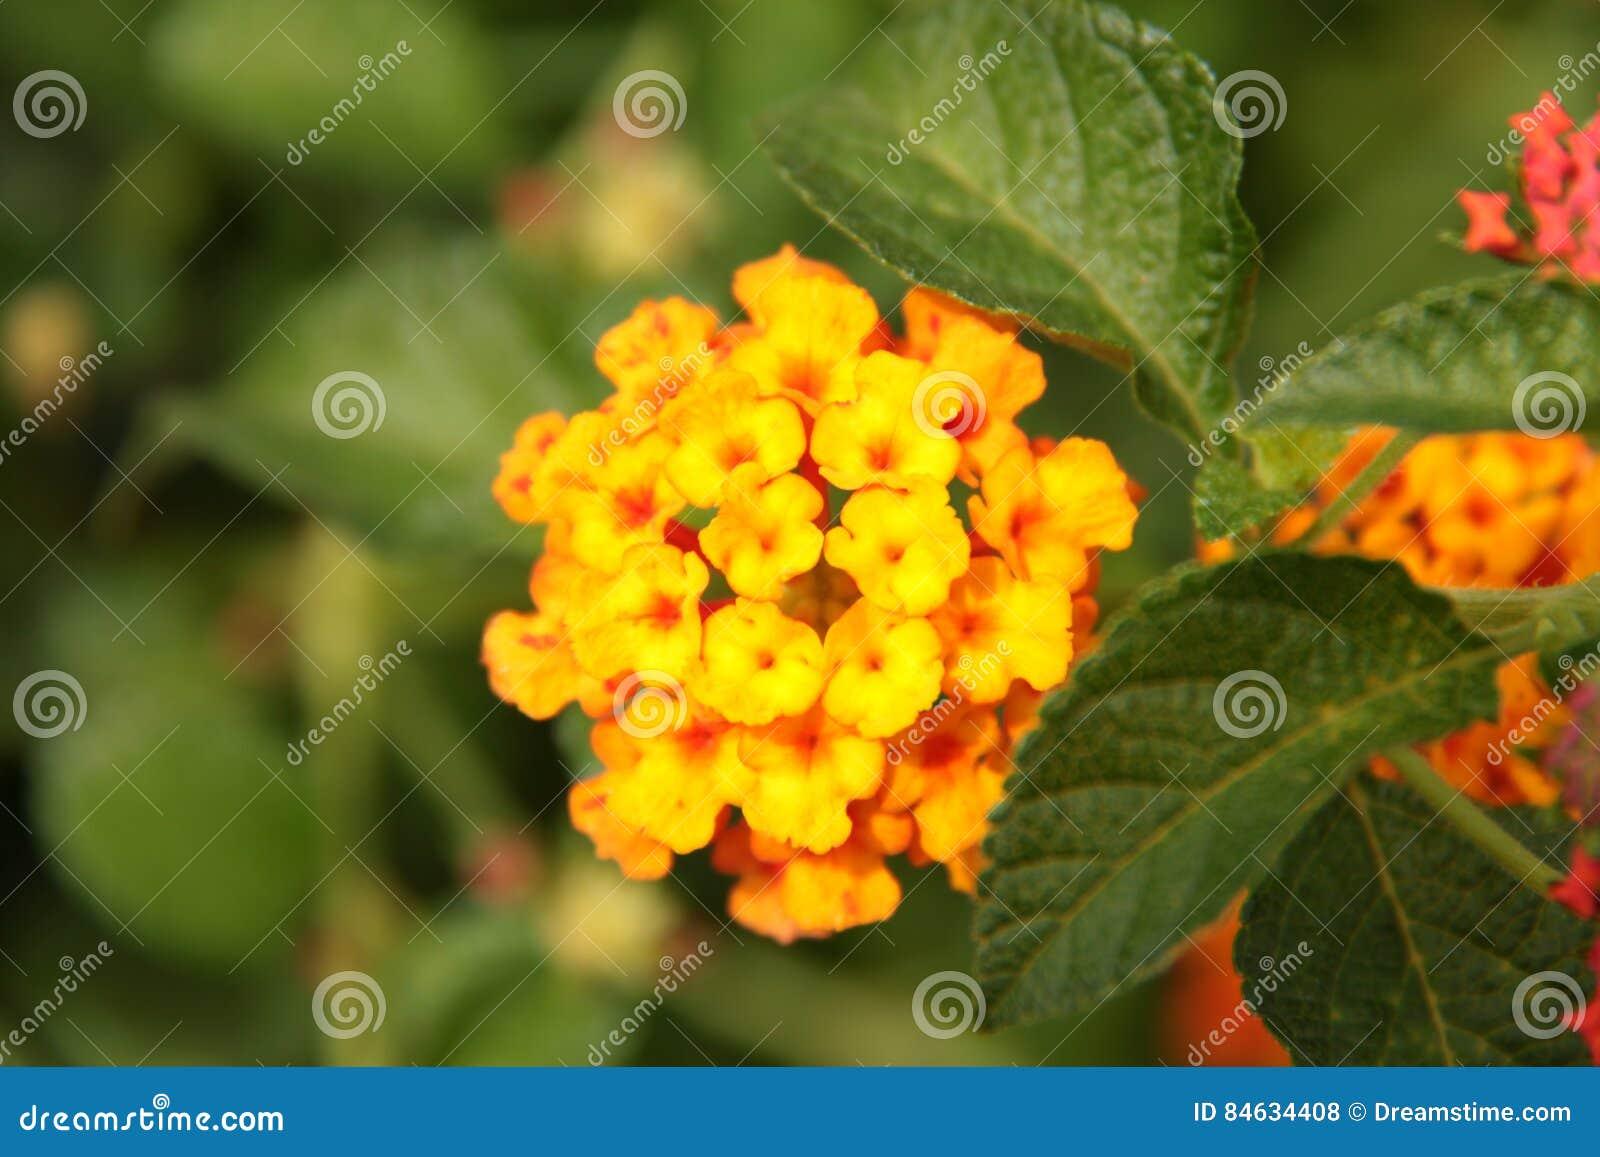 Small Yellow Flower Stock Photo Image Of Orange Foliage 84634408